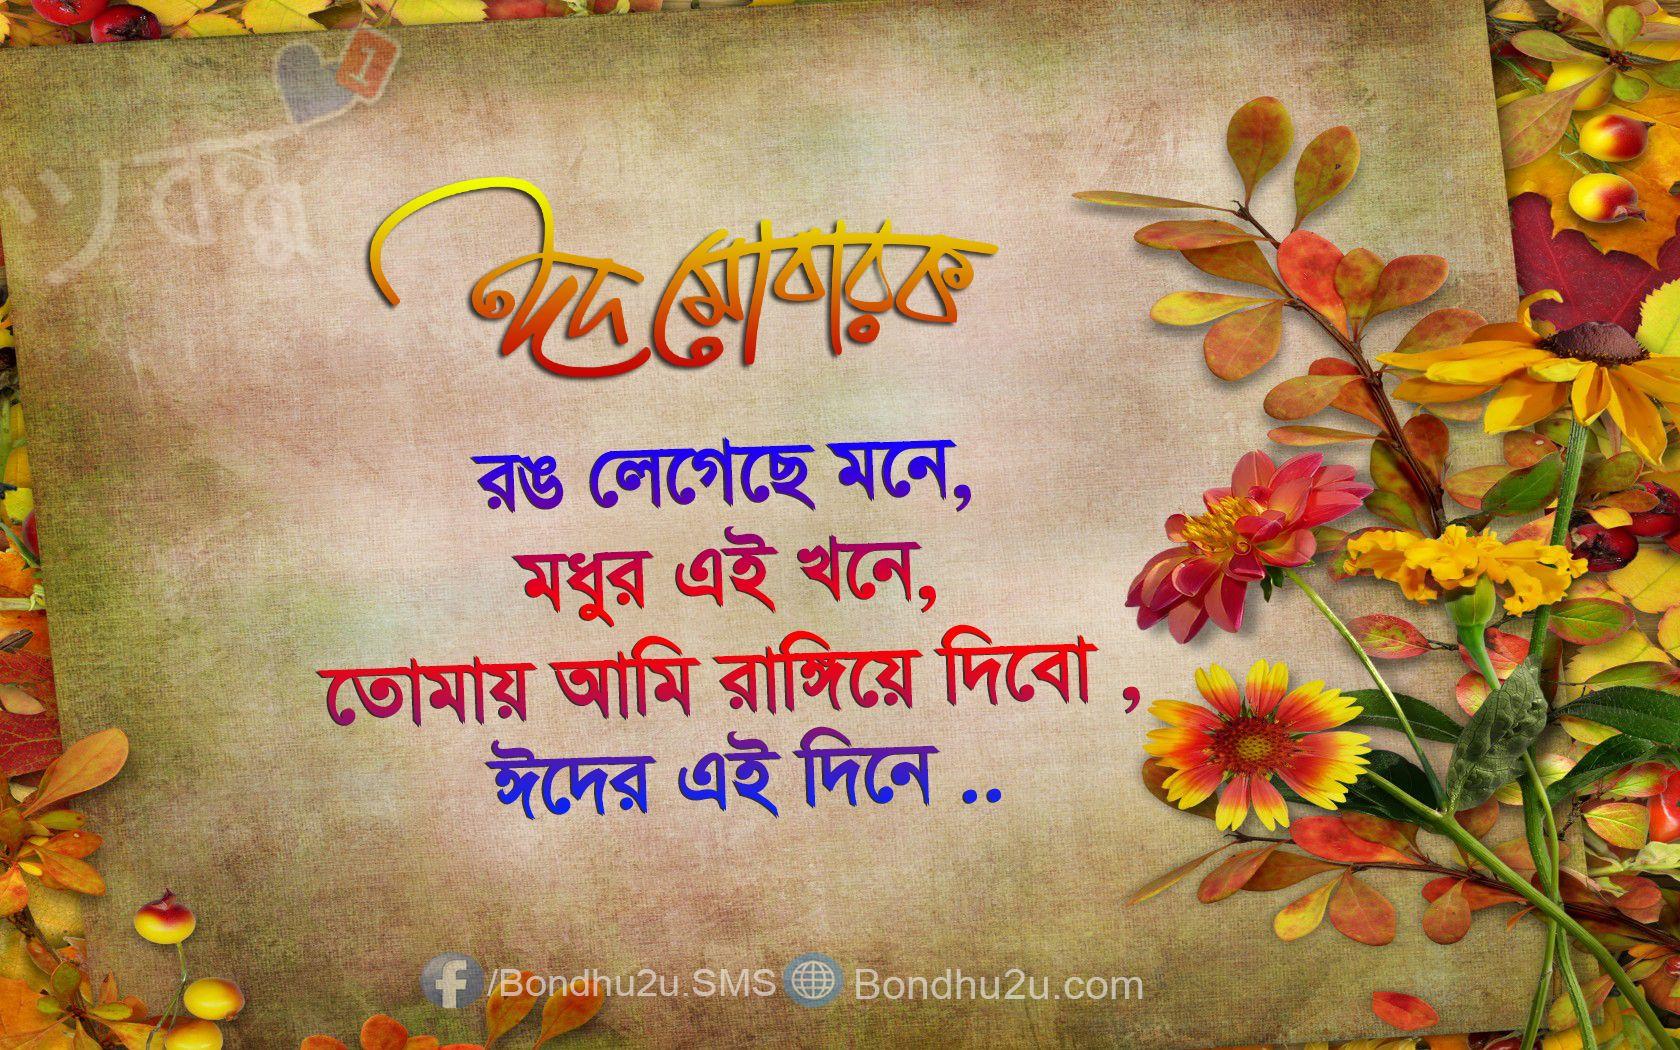 Advance Eid Sms Bangla Bangla Eid Sms 2019 Bangla Text Eid Sms Eid